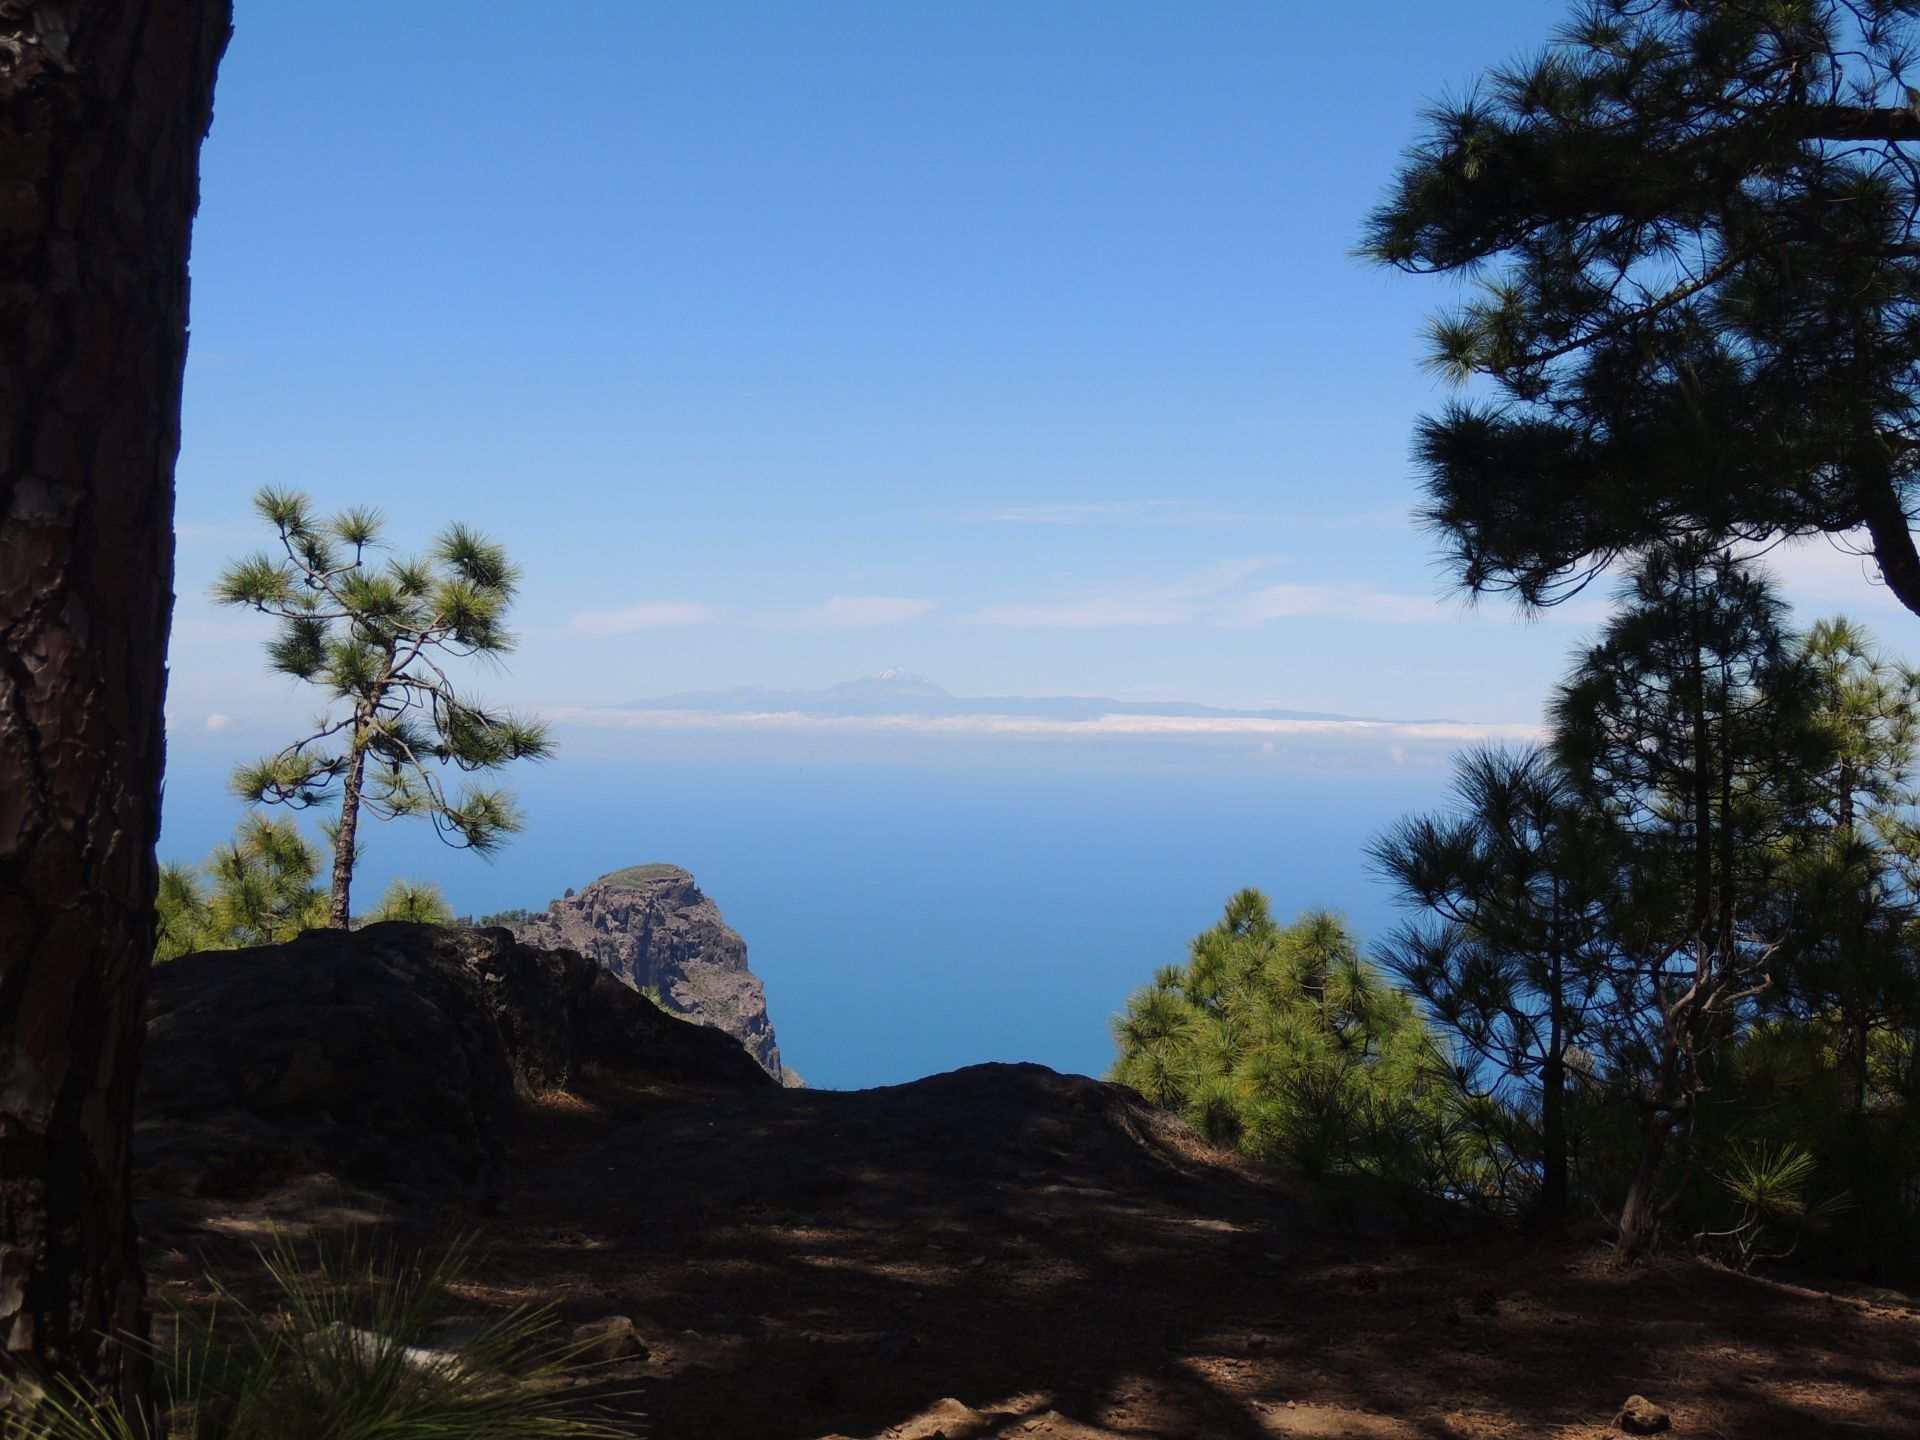 Utsikt fra Tamabada Agaete Gran Canaria Vest - Theislandsinthesun.com